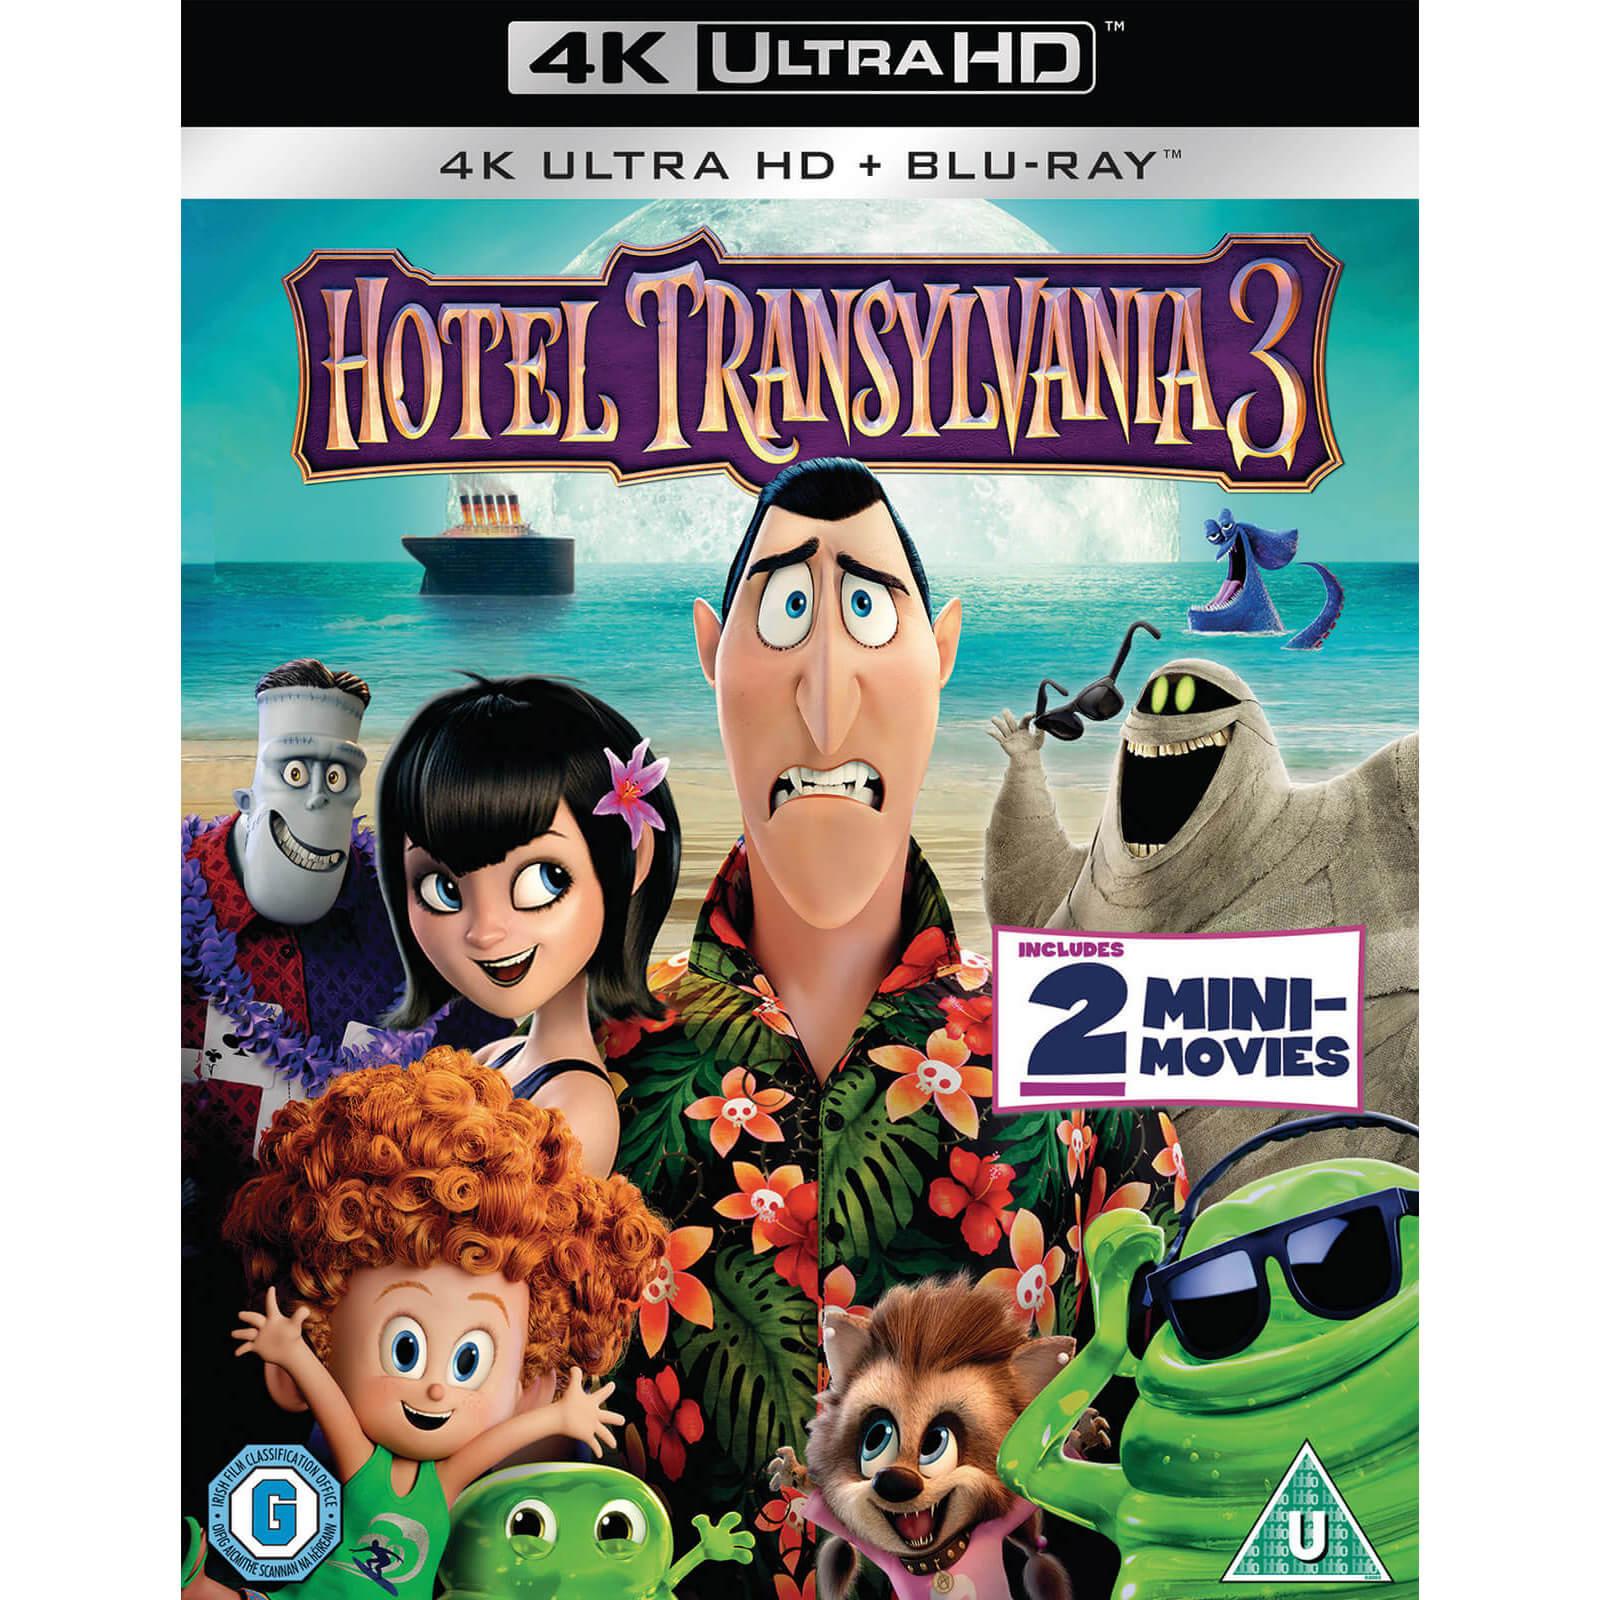 Sony Hotel Transylvania 3 - 4K Ultra HD